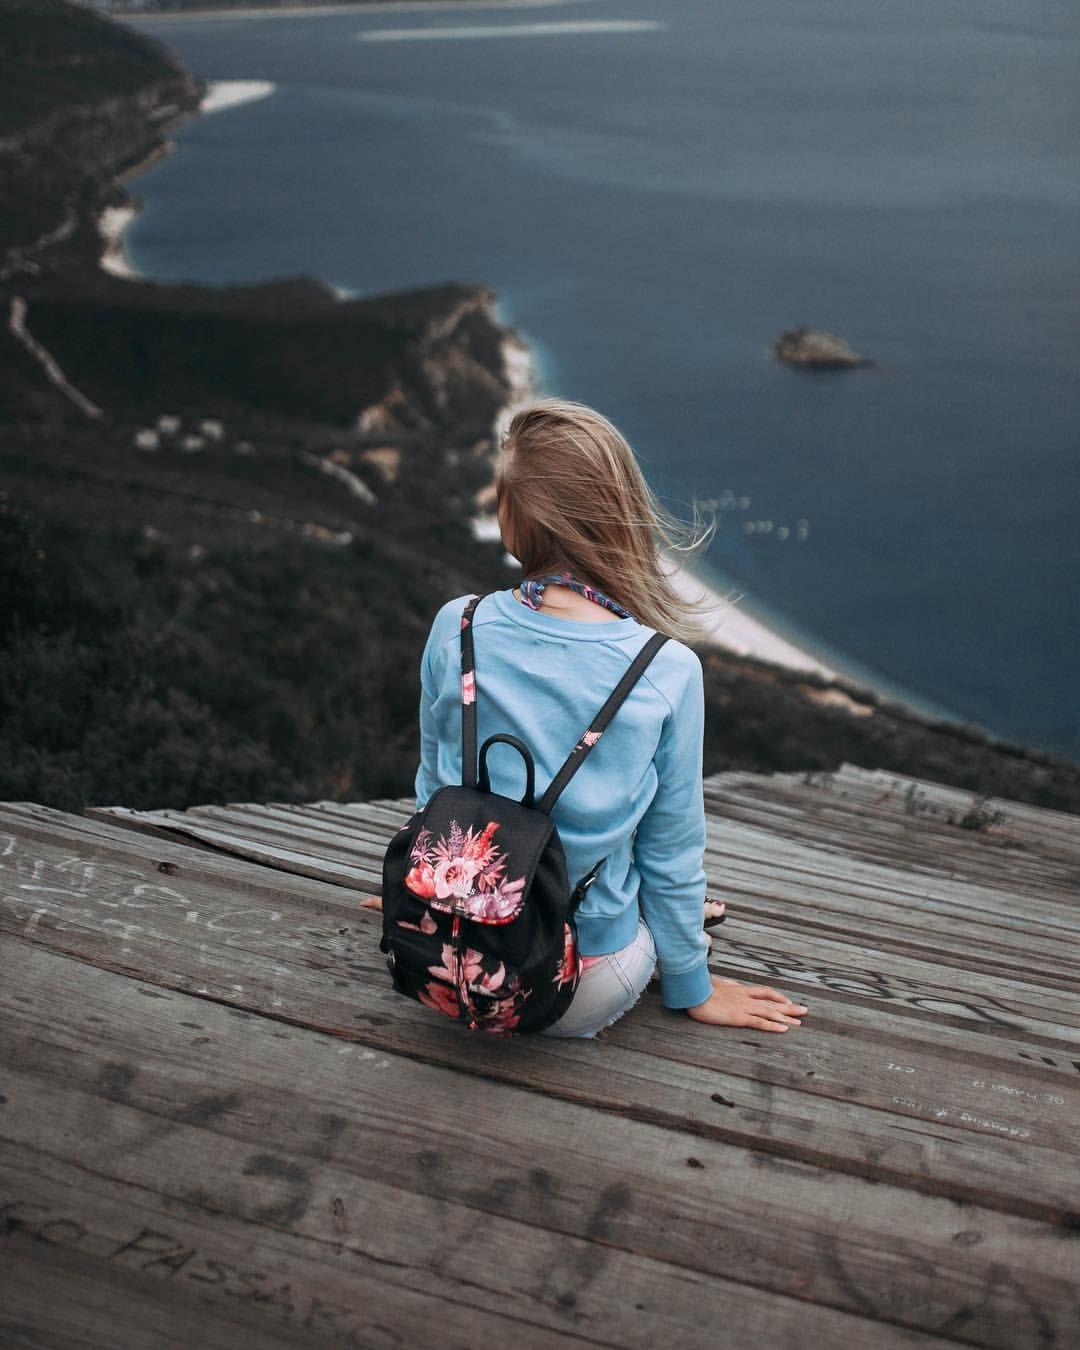 #Alone #Girl #Sad #Sea #Photography 😌